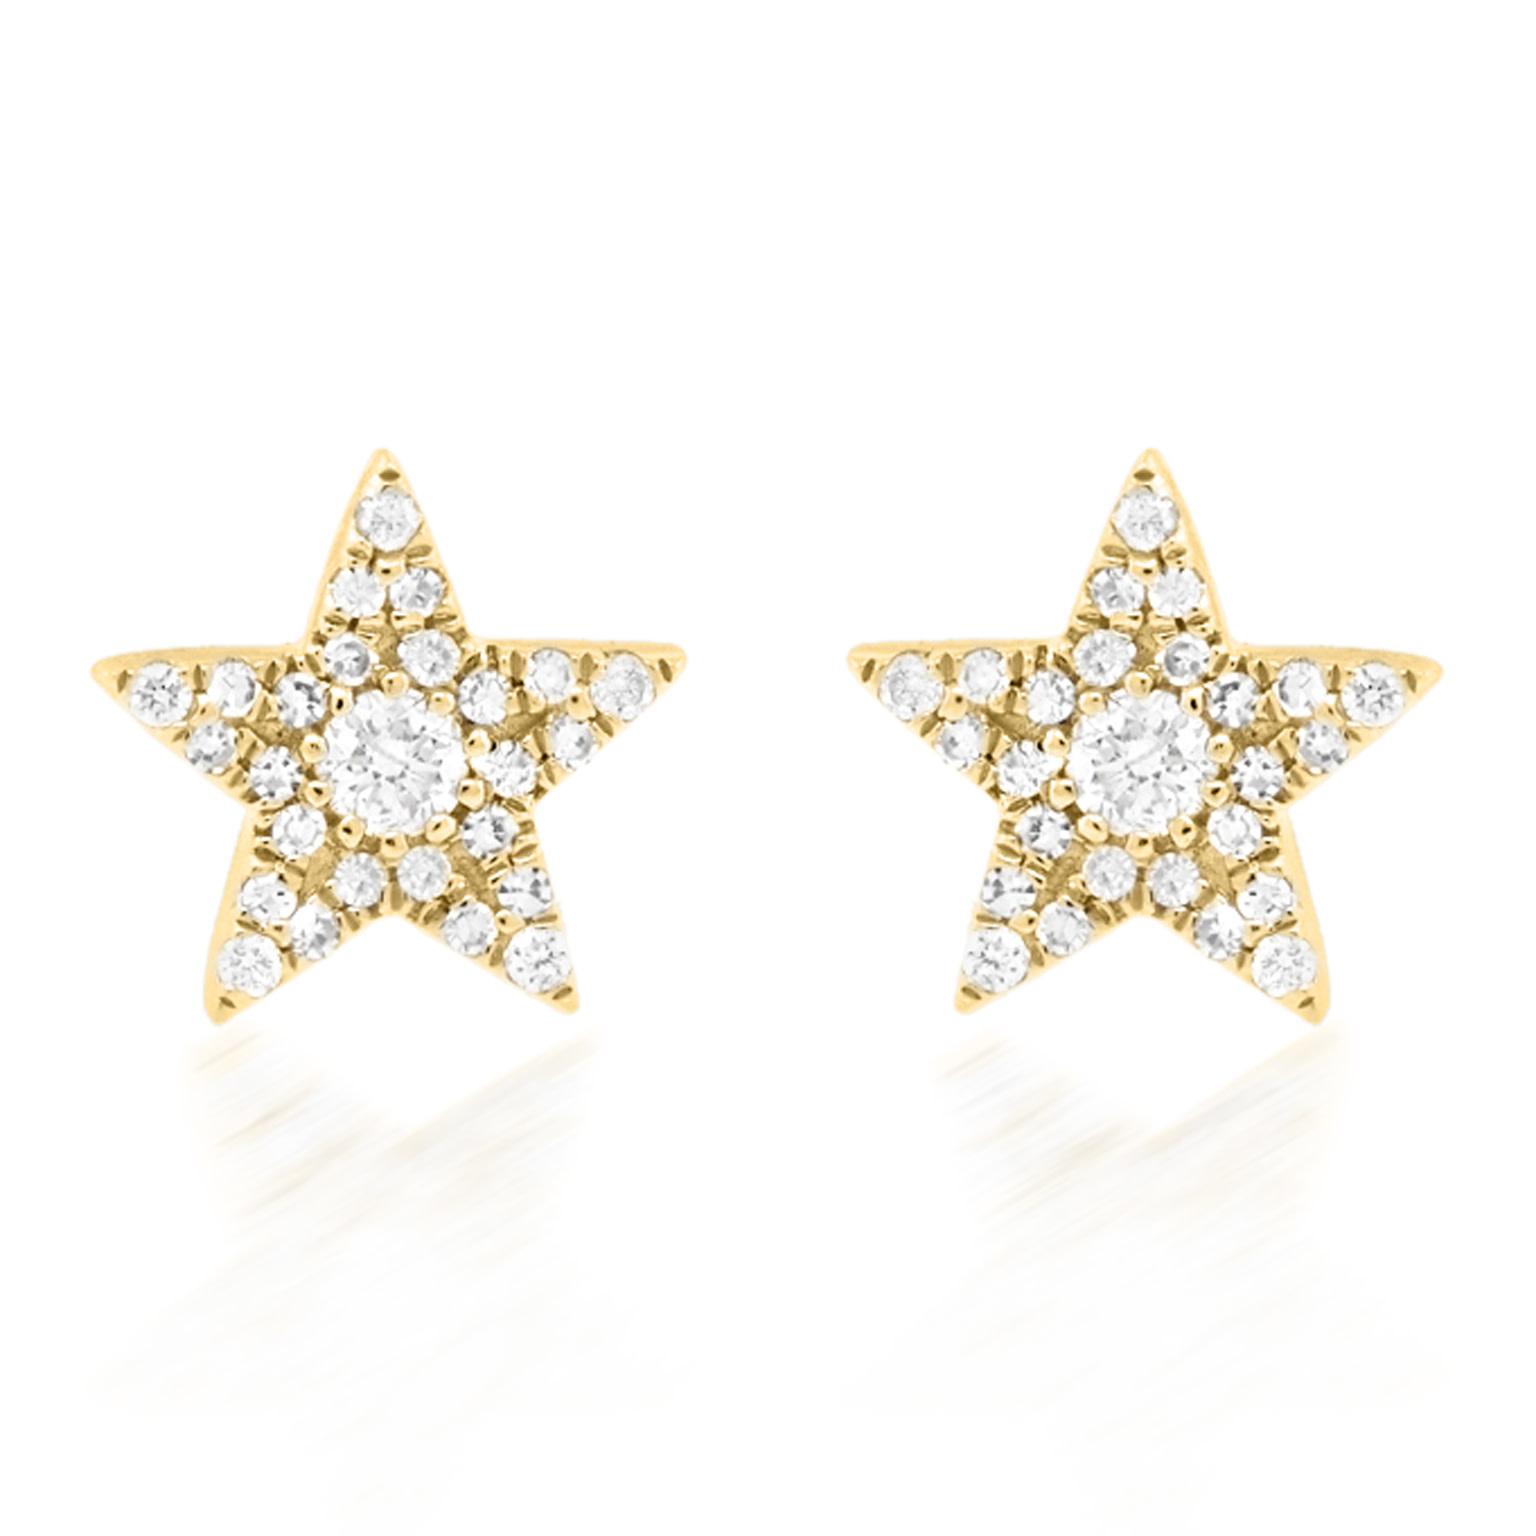 Trabert Goldsmiths Pave Diamond Star Stud Earrings